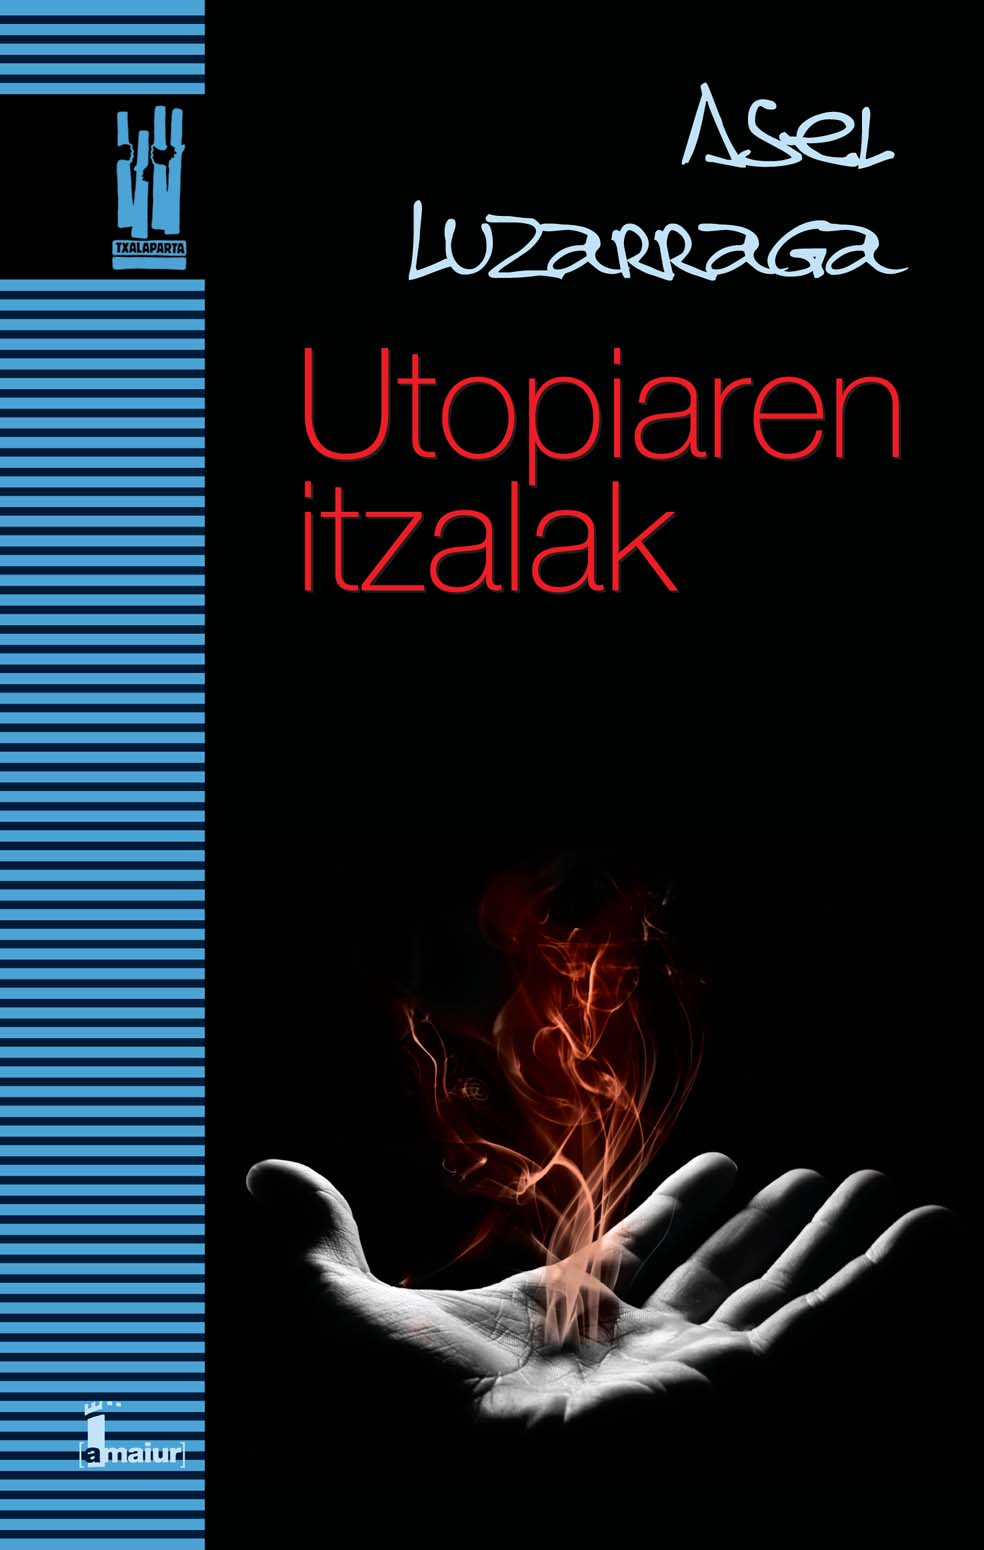 Utopiaren itzalak (Las sombras de la utopía)